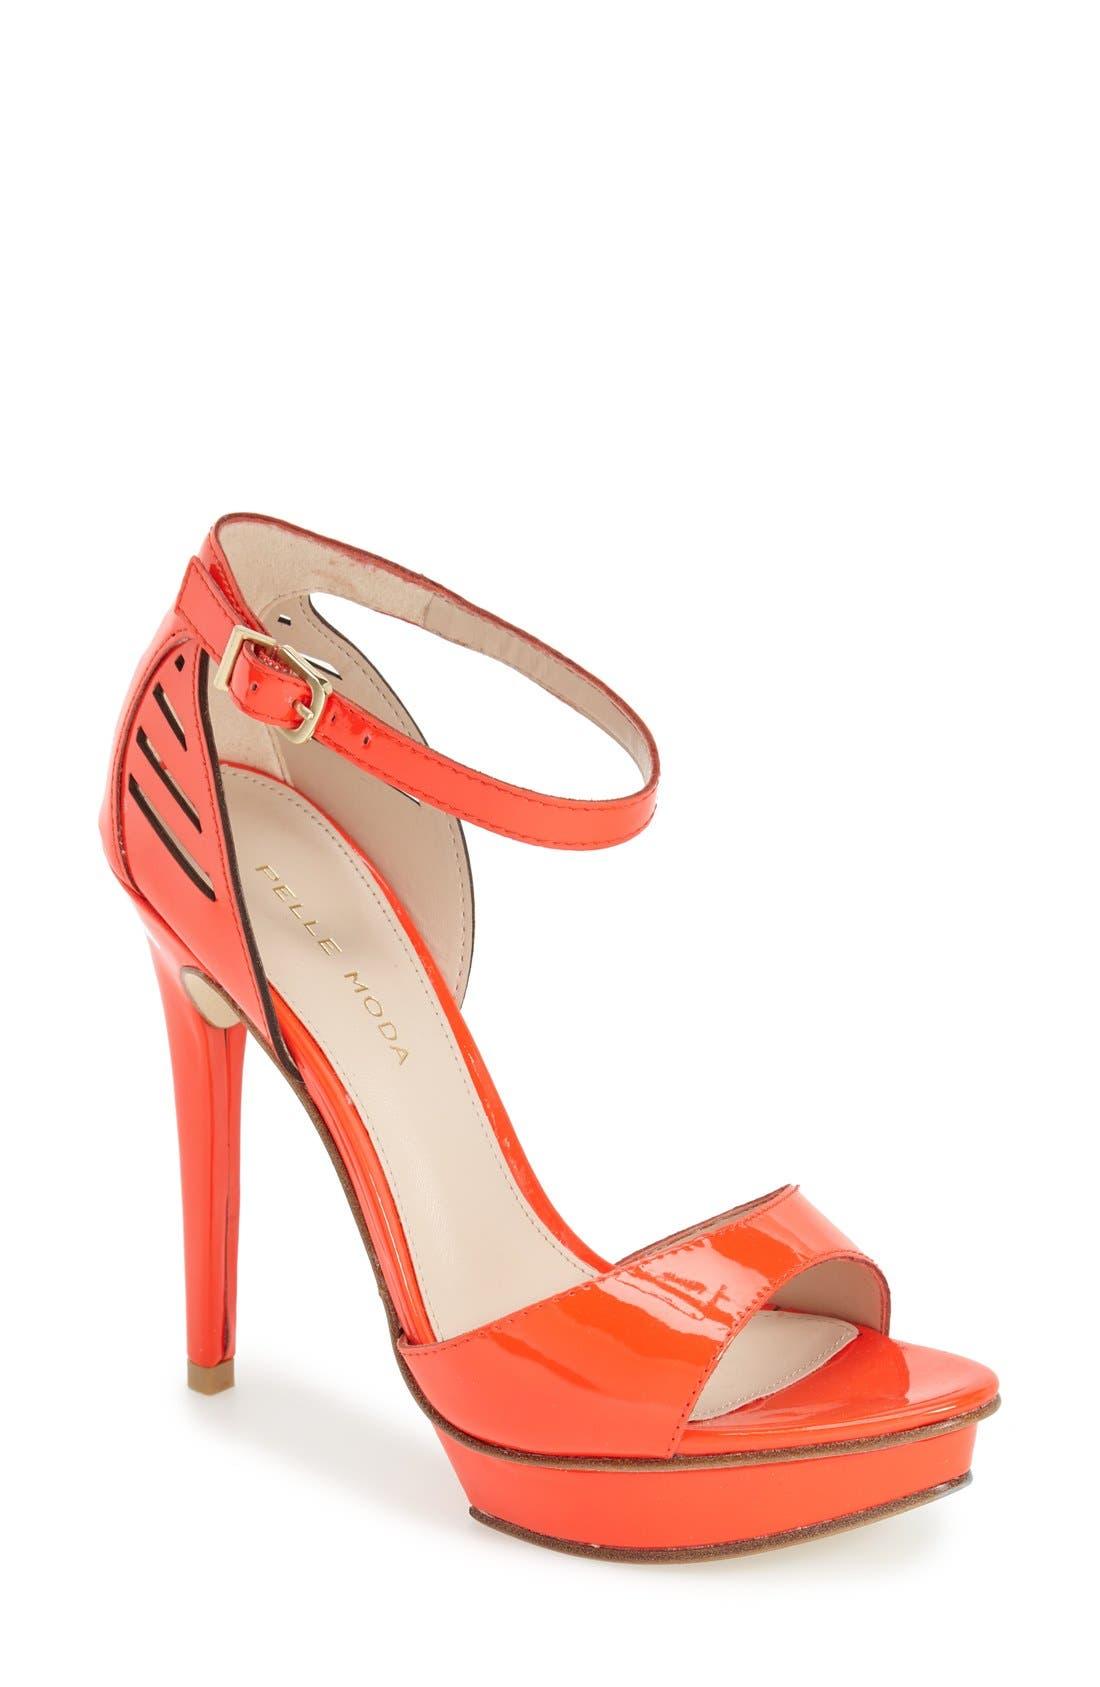 'Fenton' Ankle Strap Sandal,                             Main thumbnail 6, color,